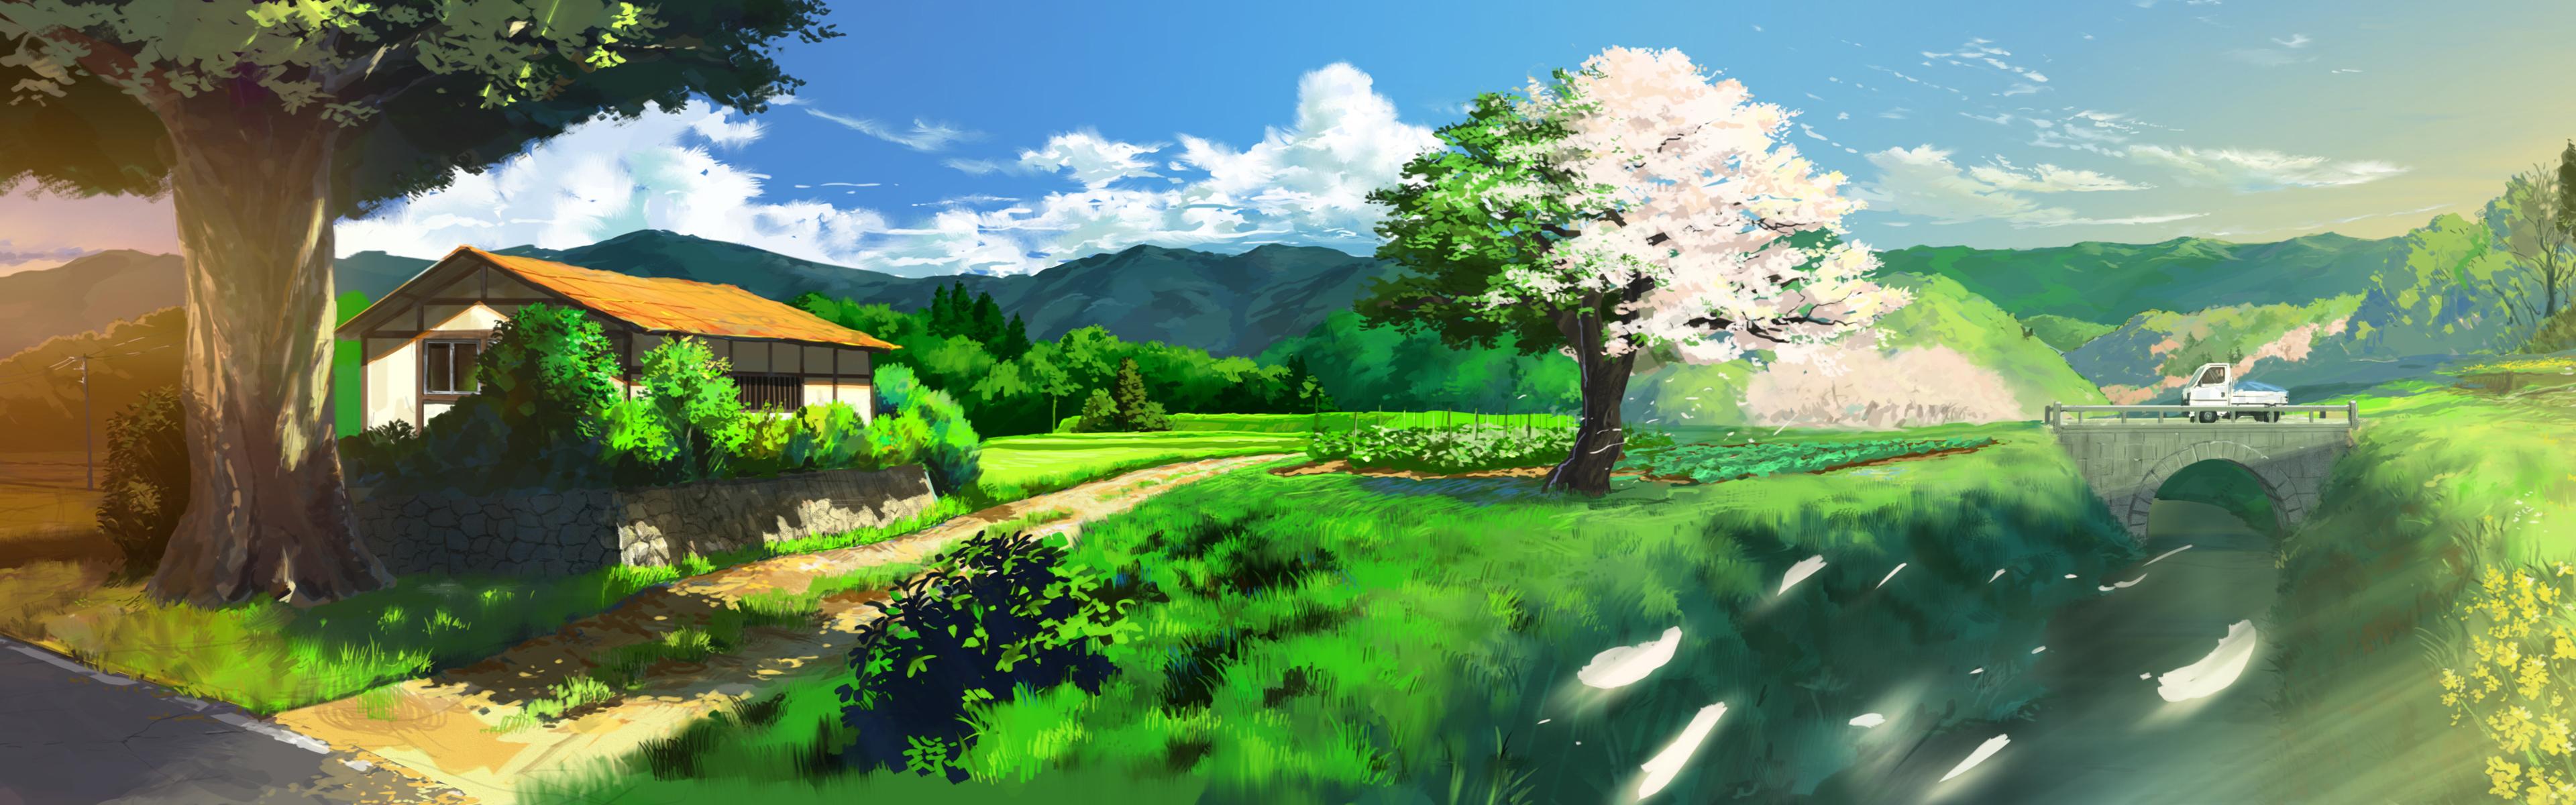 Original HD Wallpaper | Background Image | 3840x1200 | ID ...